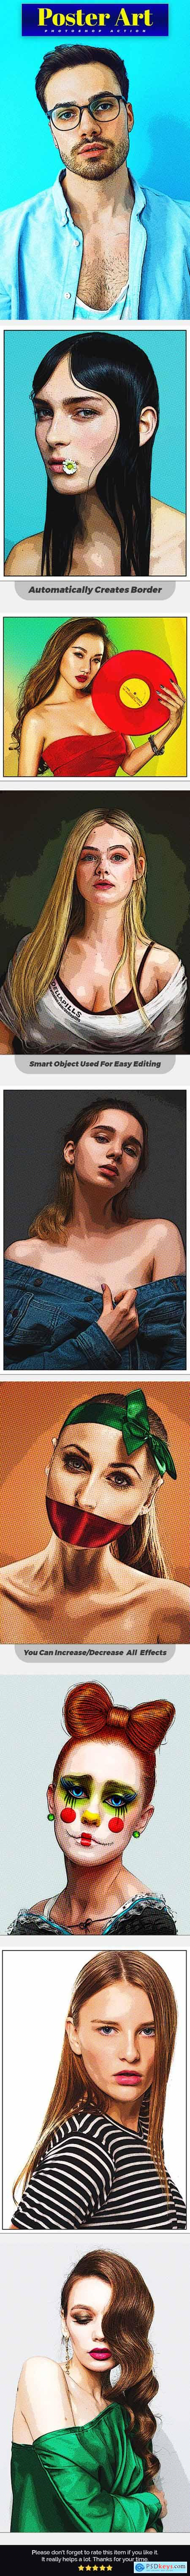 Poster Art 24624331